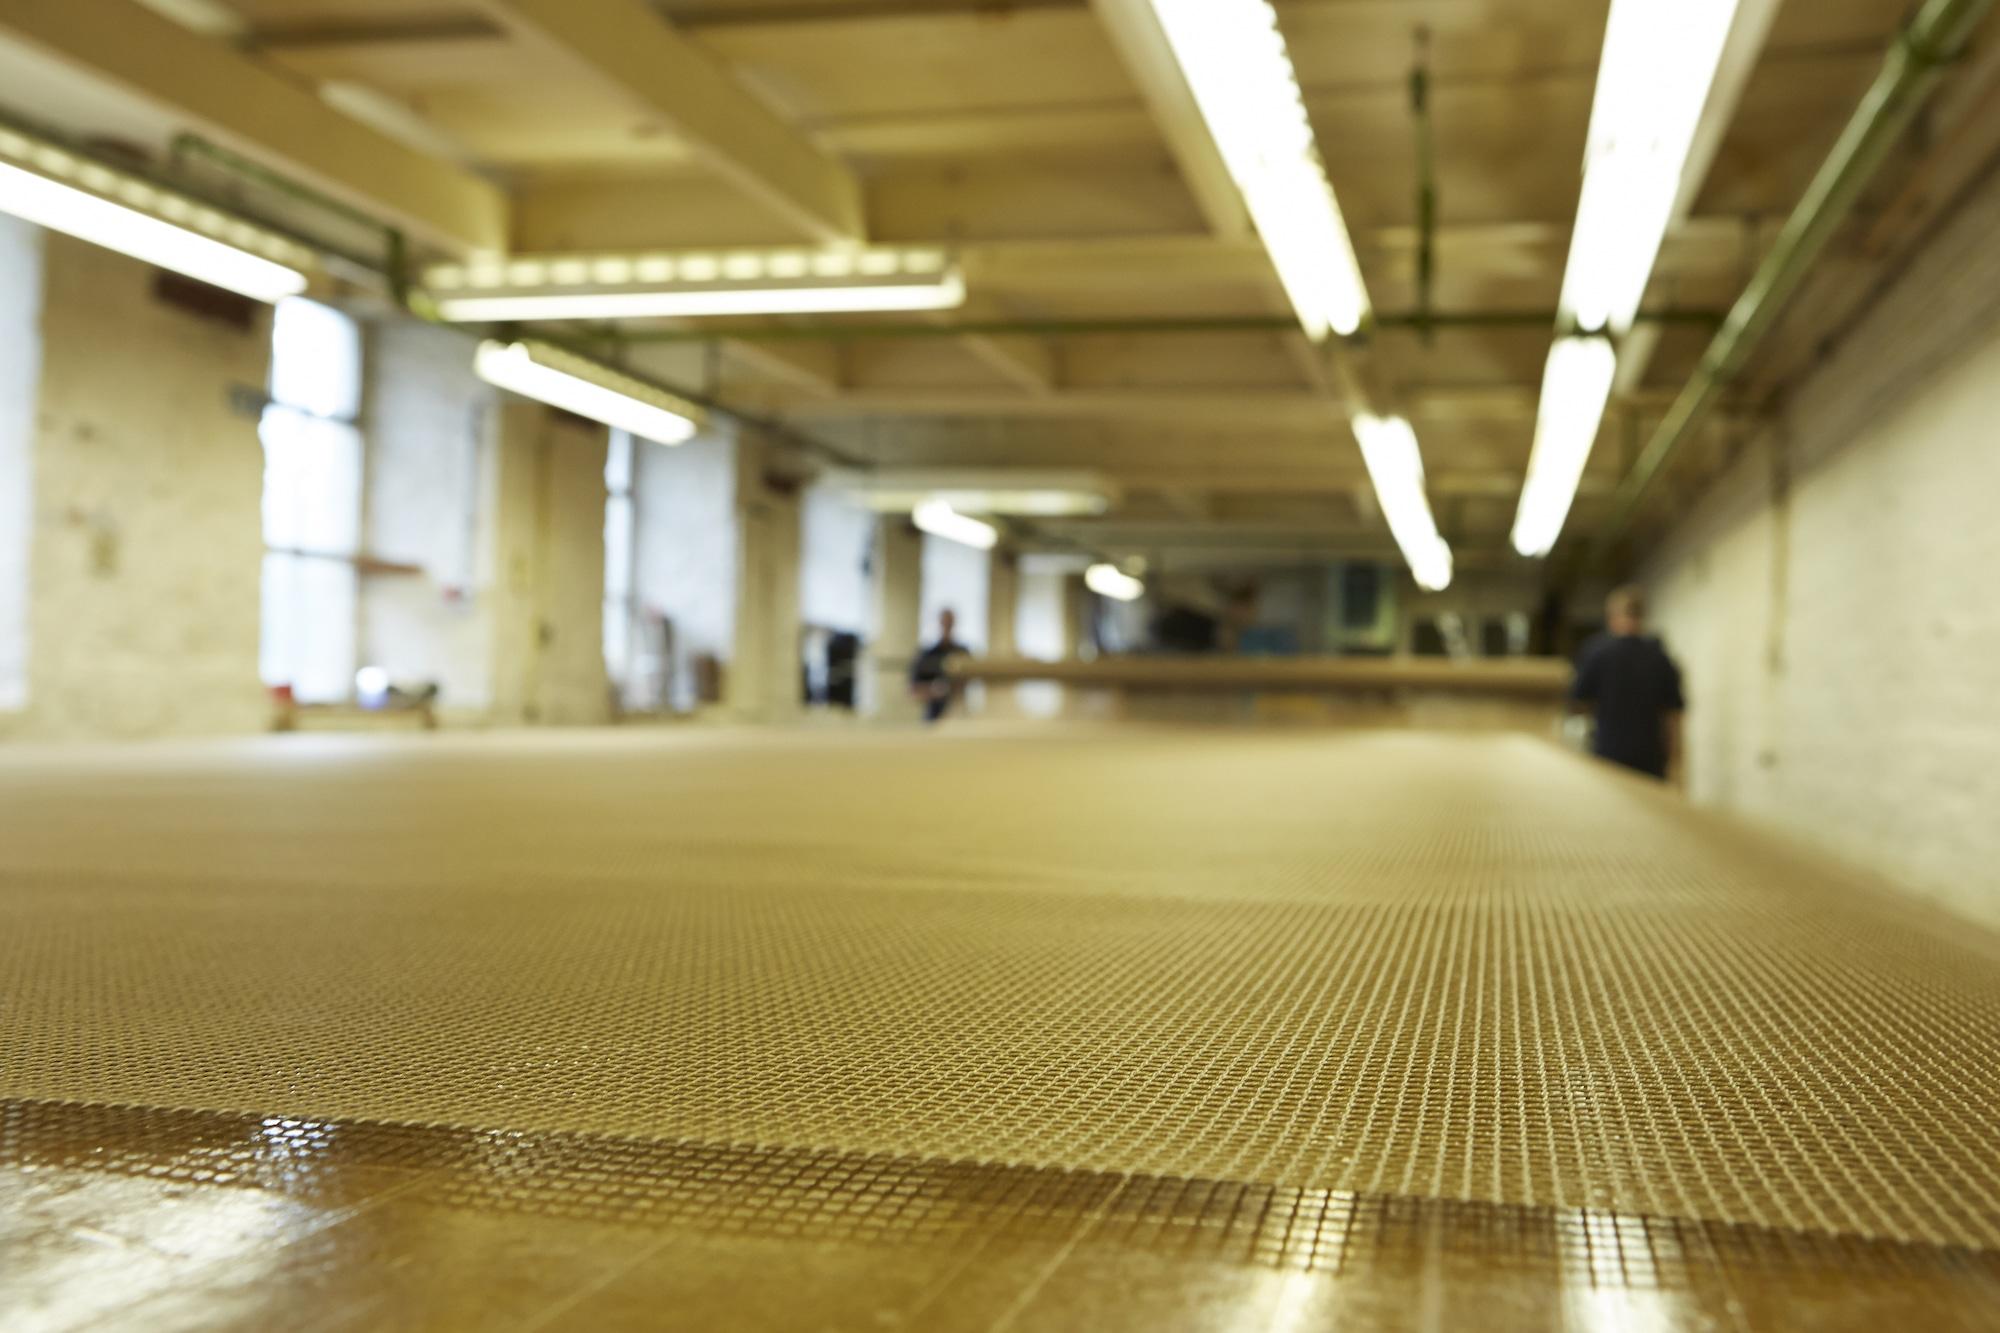 Pasta steaming belt & completed dewatering conveyor belt